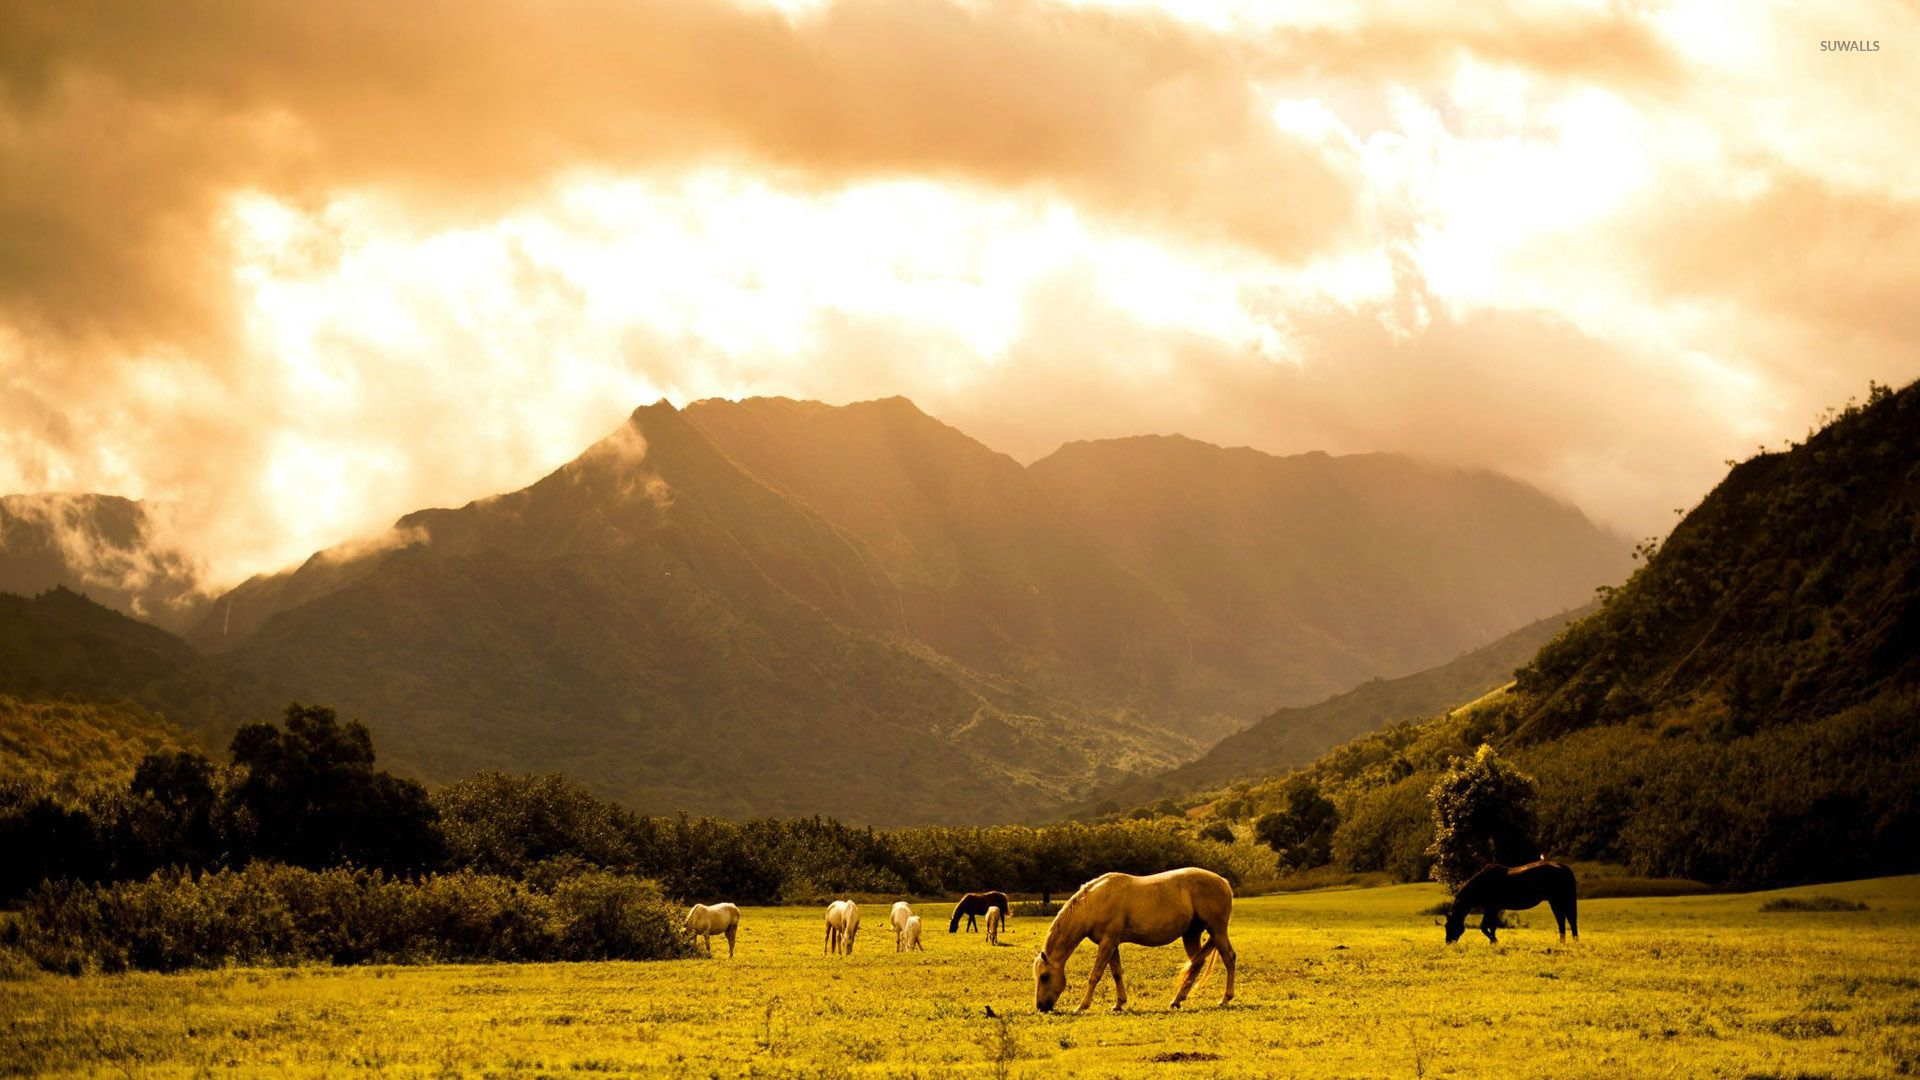 beautiful horse images